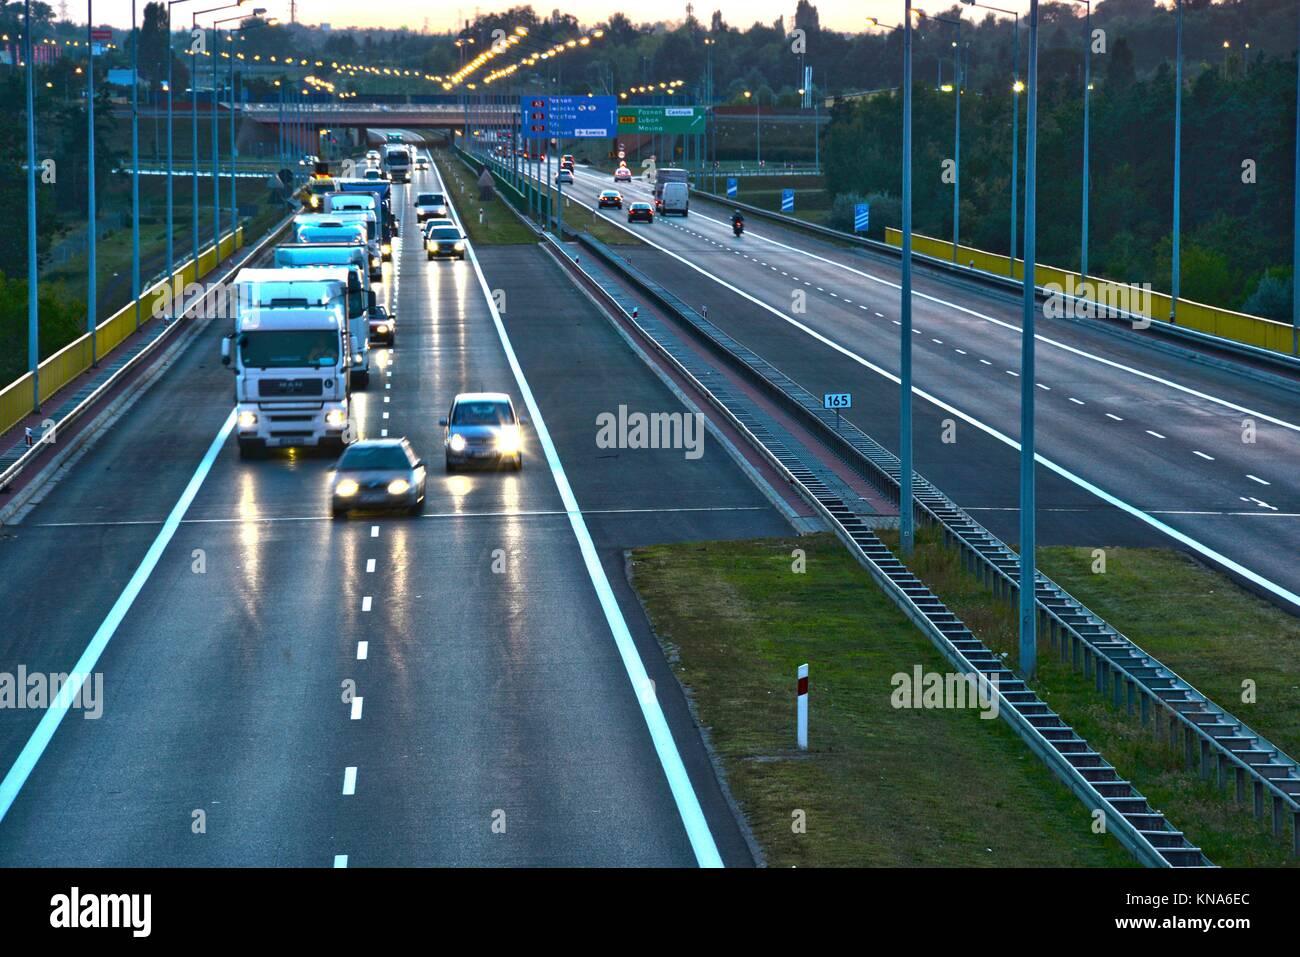 Kontrollierter Zugang Autobahn in Poznan, Polen. Stockfoto